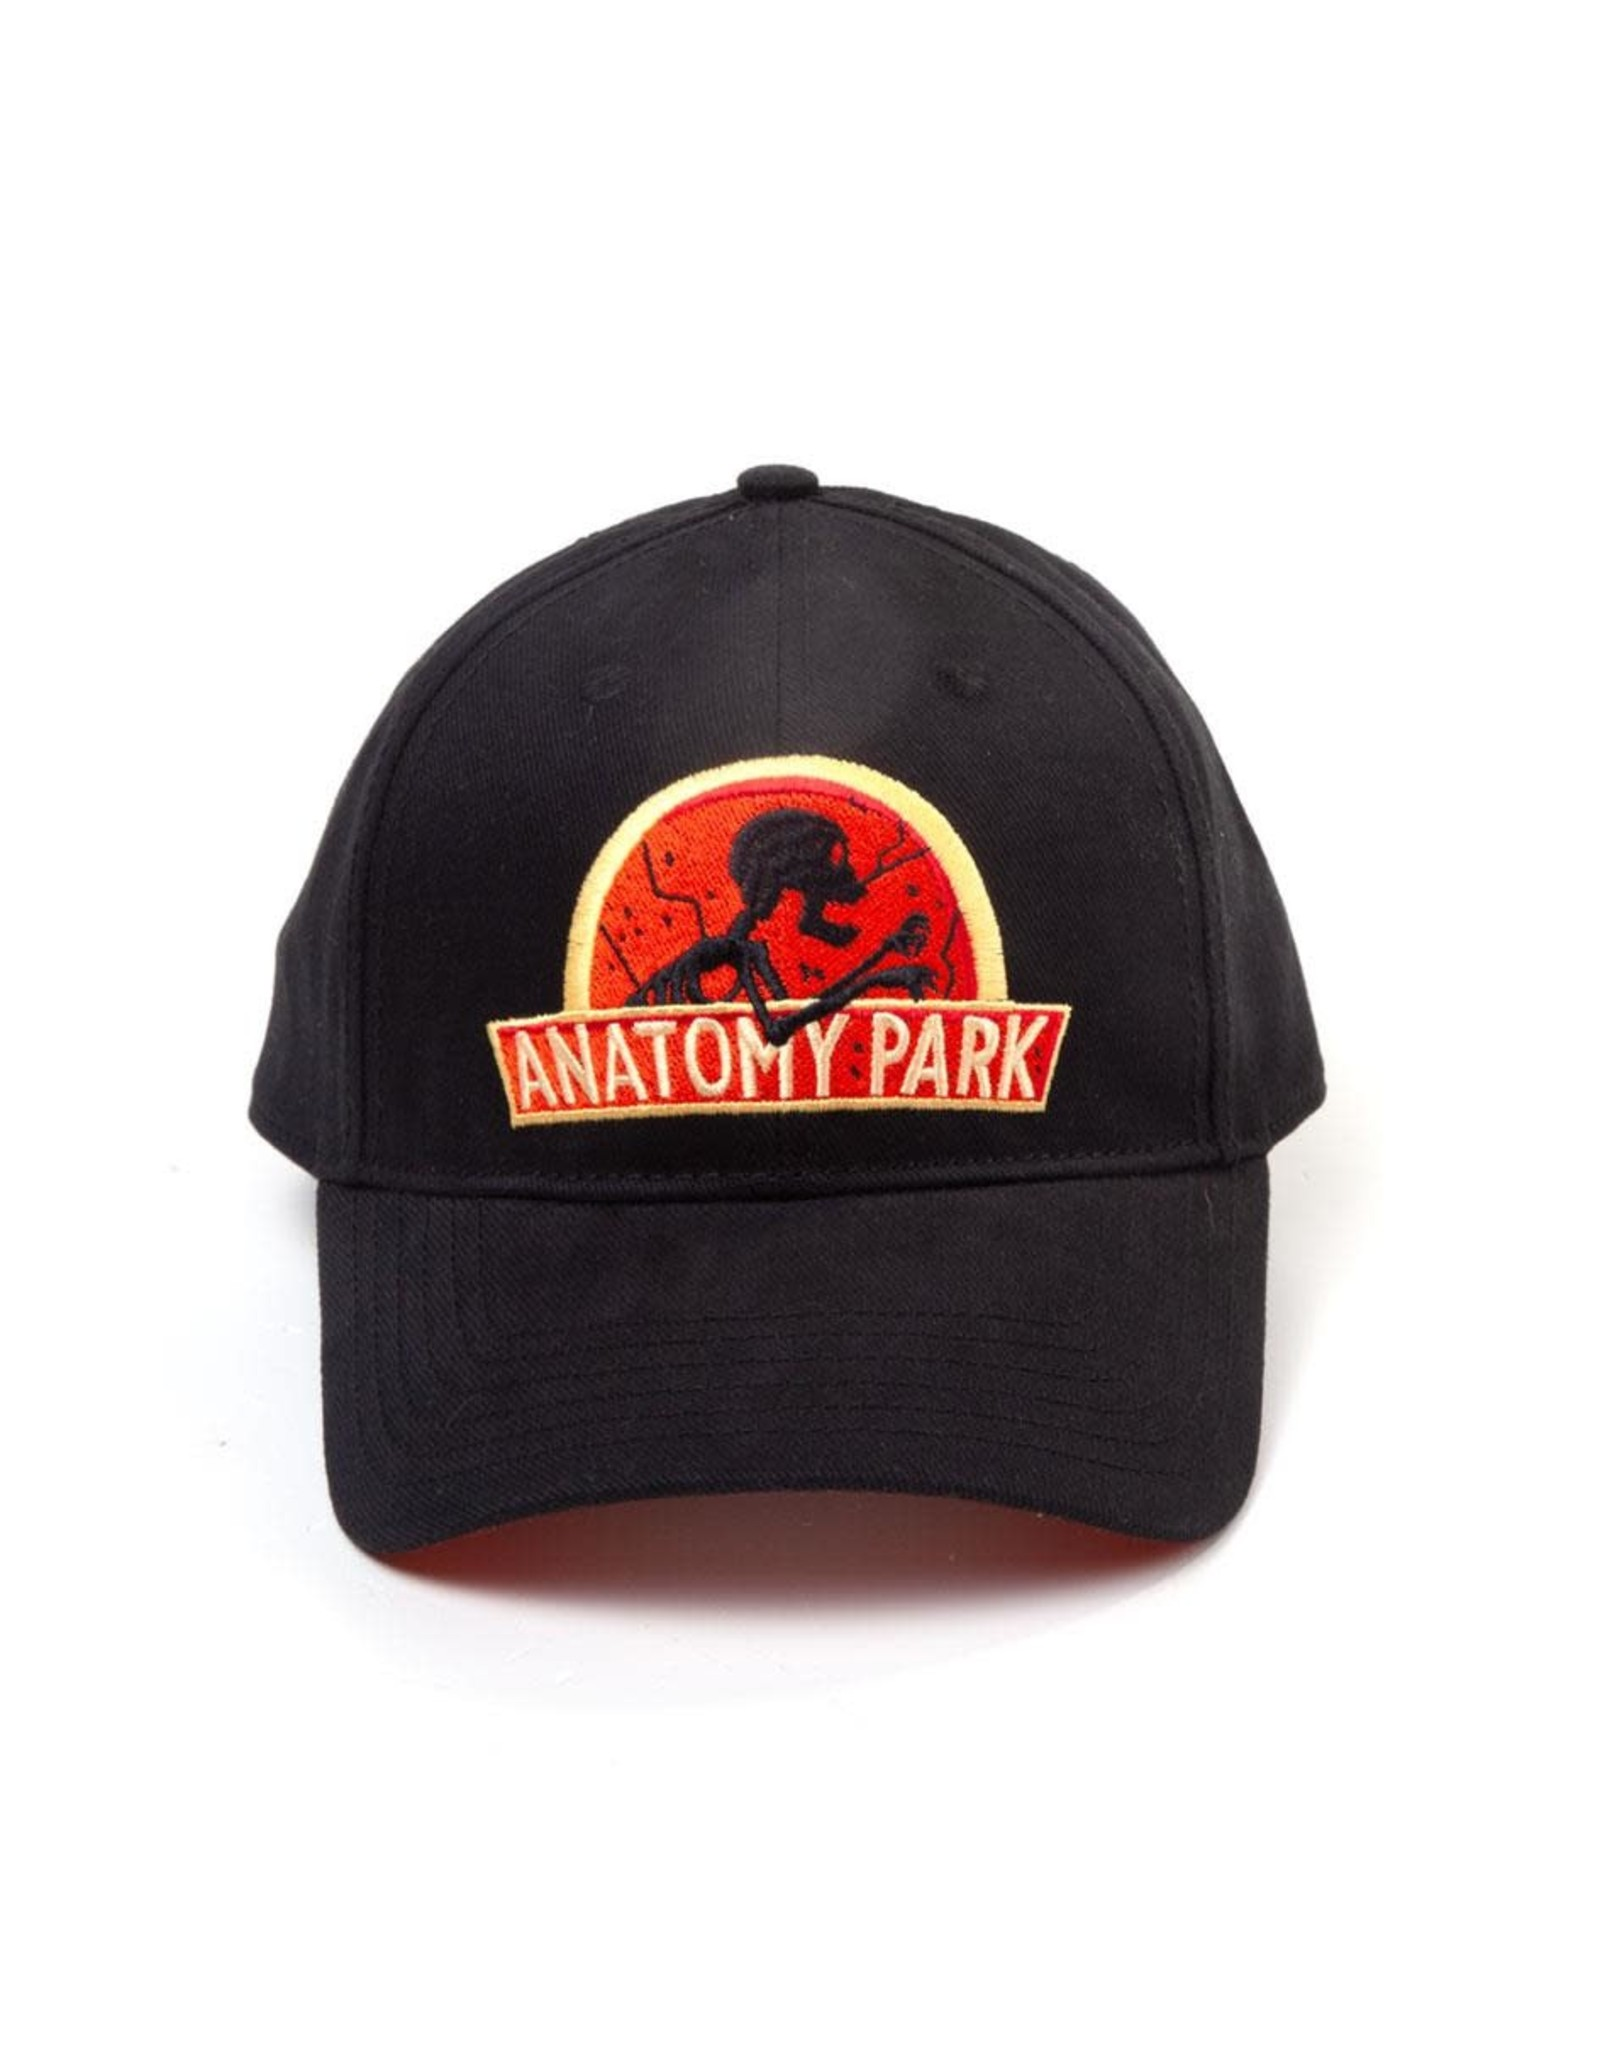 RICK AND MORTY - Cap - Anatomy Park